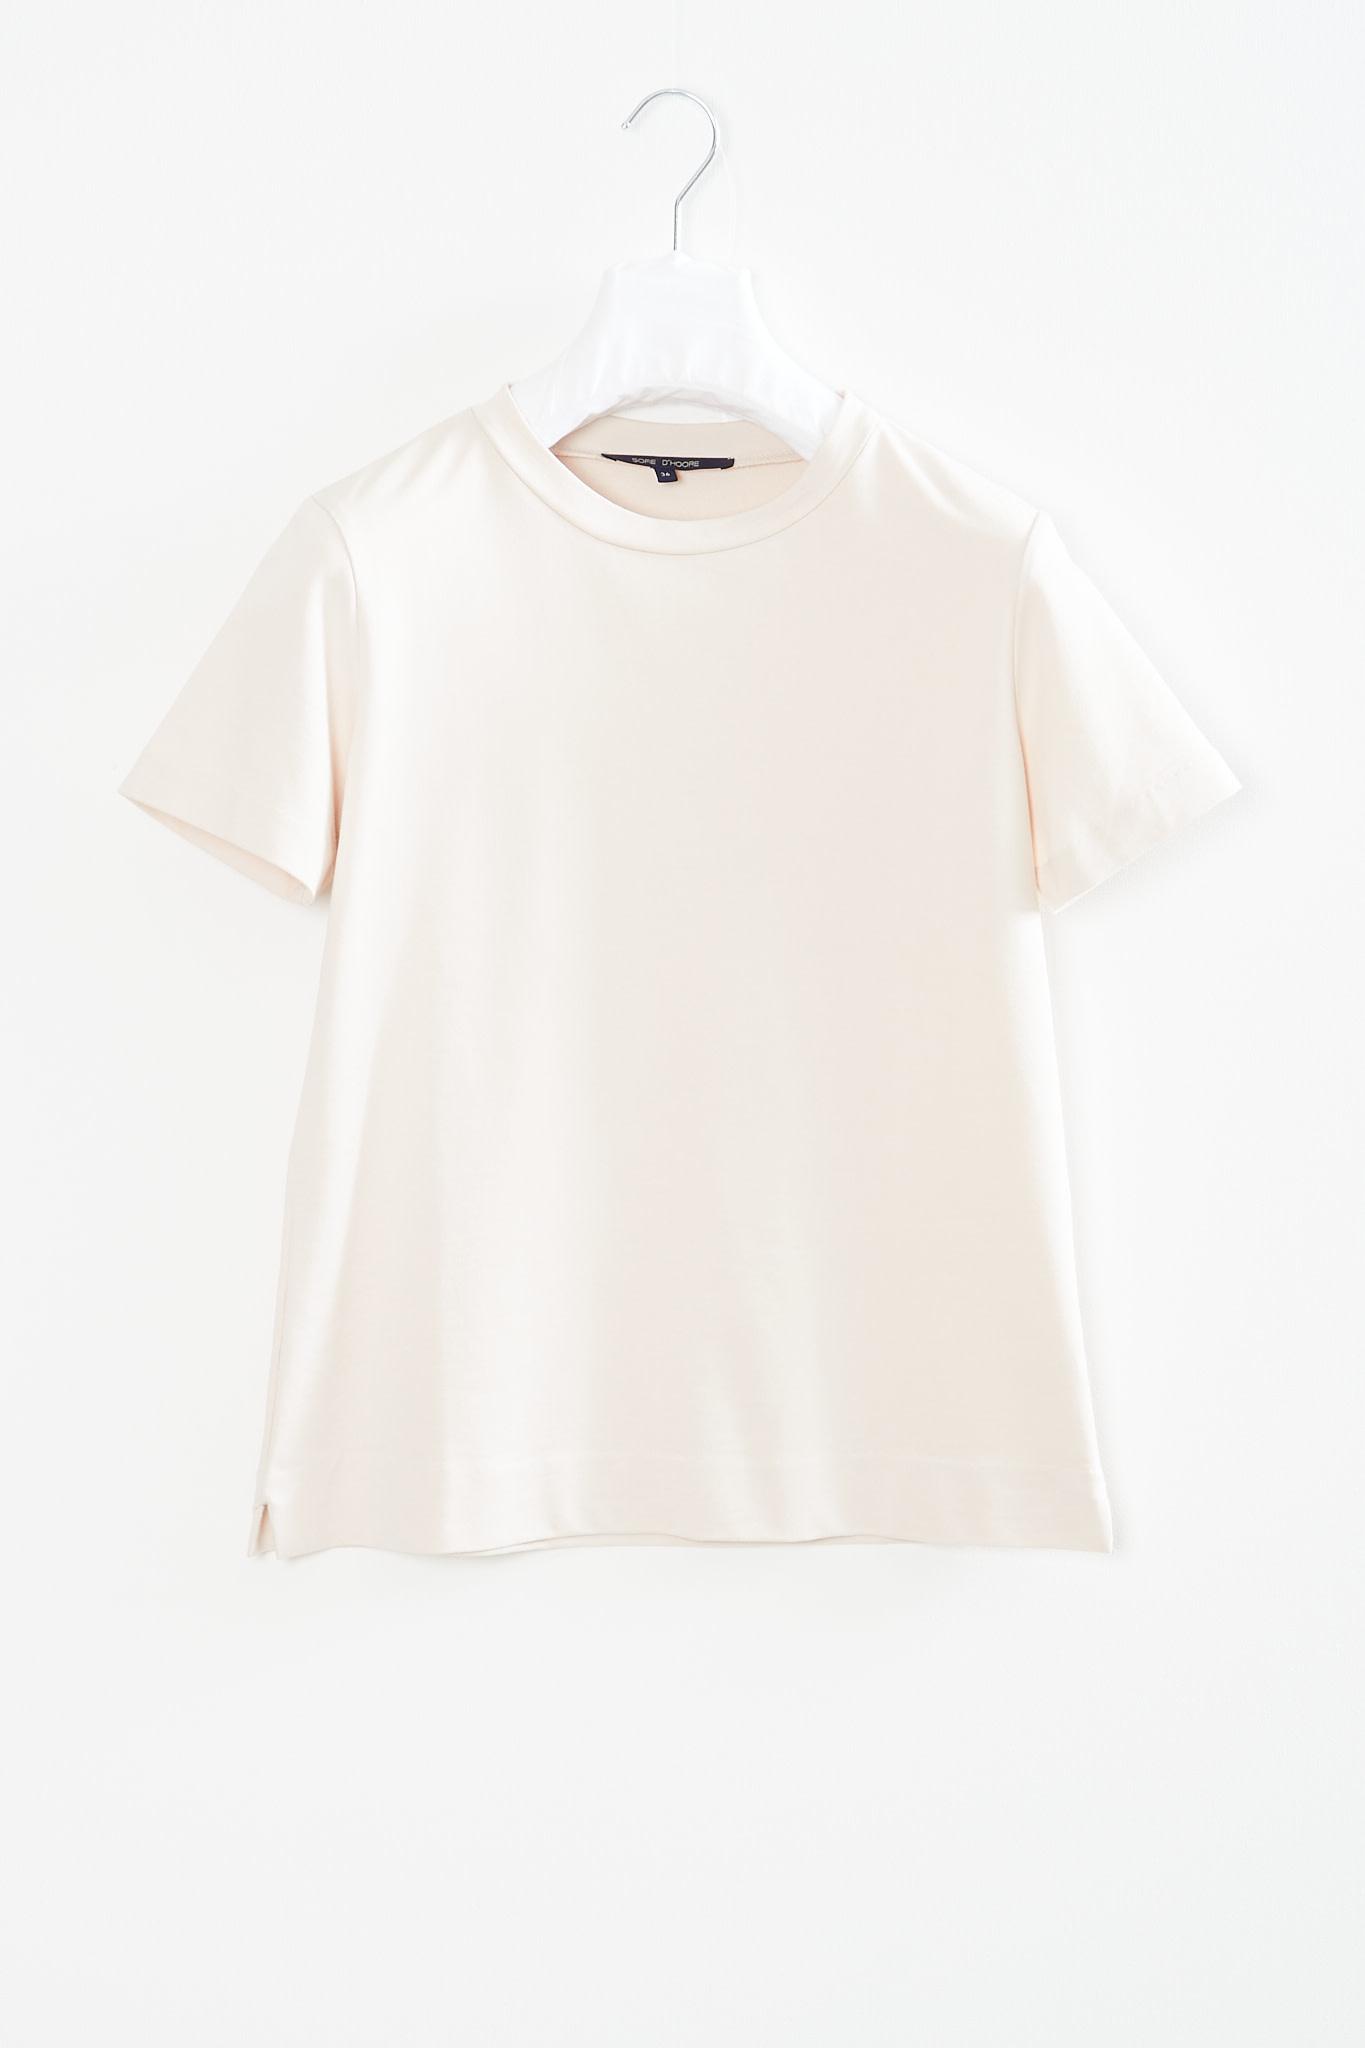 Sofie d'Hoore - Trust fine cotton fleece t-shirt